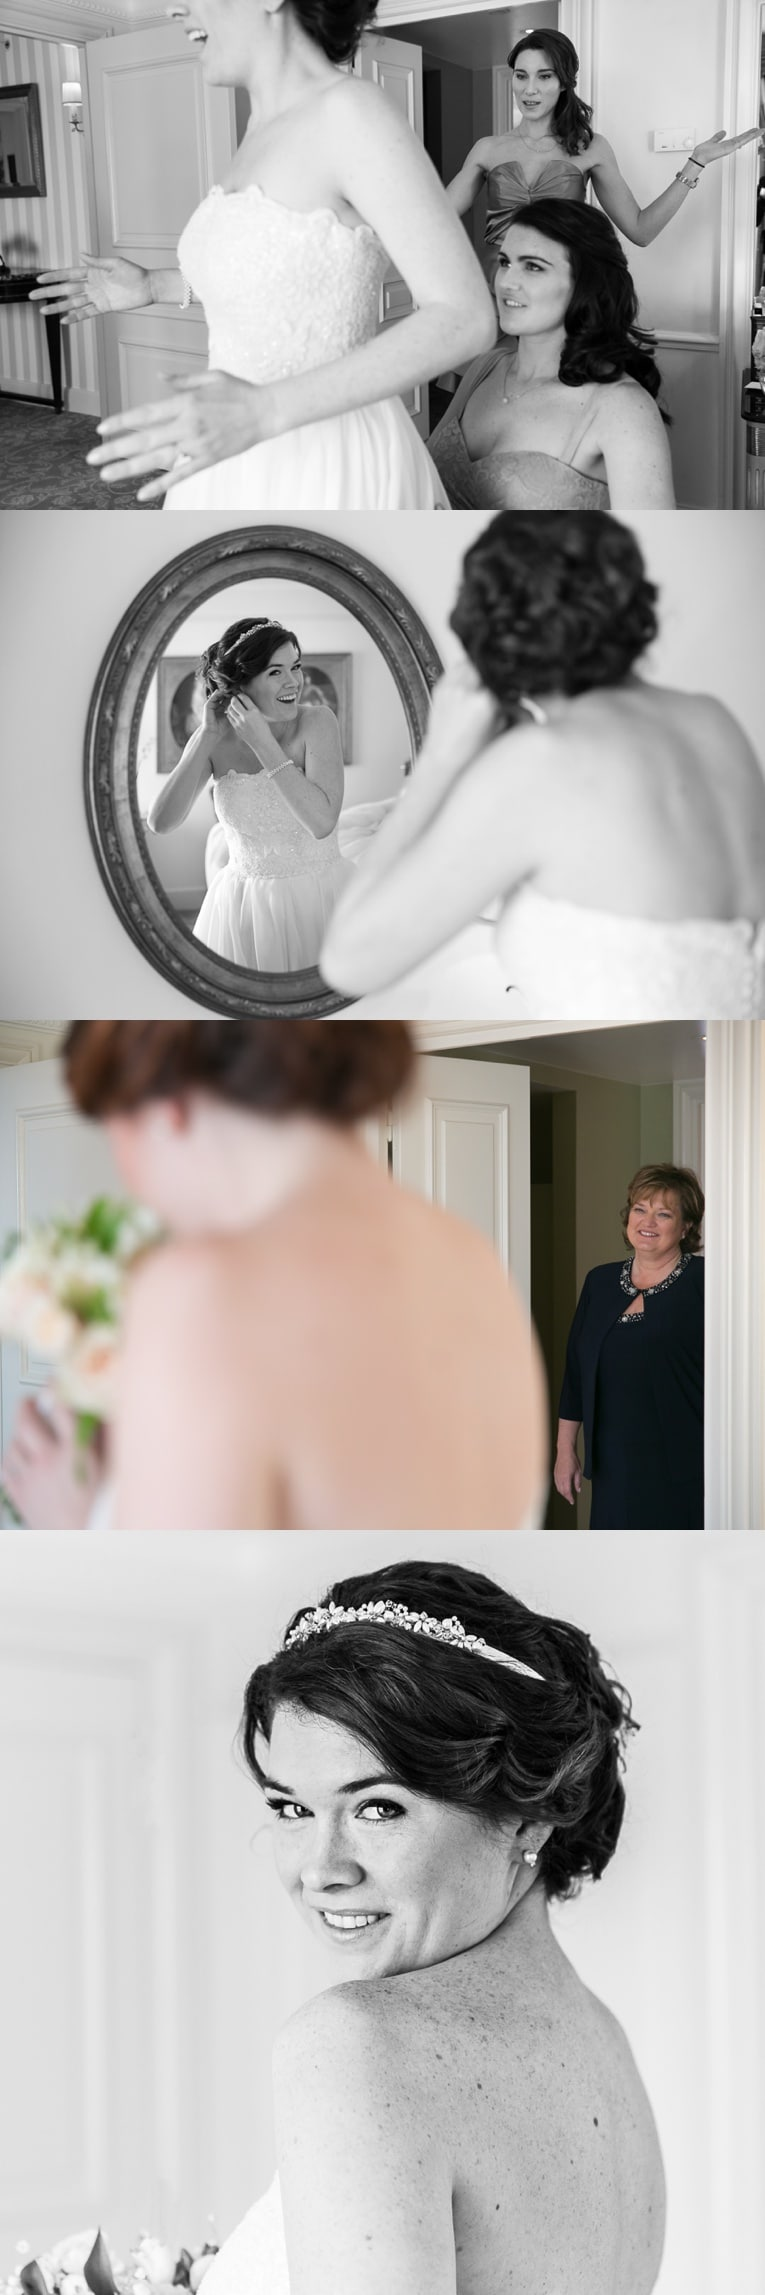 wedding-four-seasons-paris-02